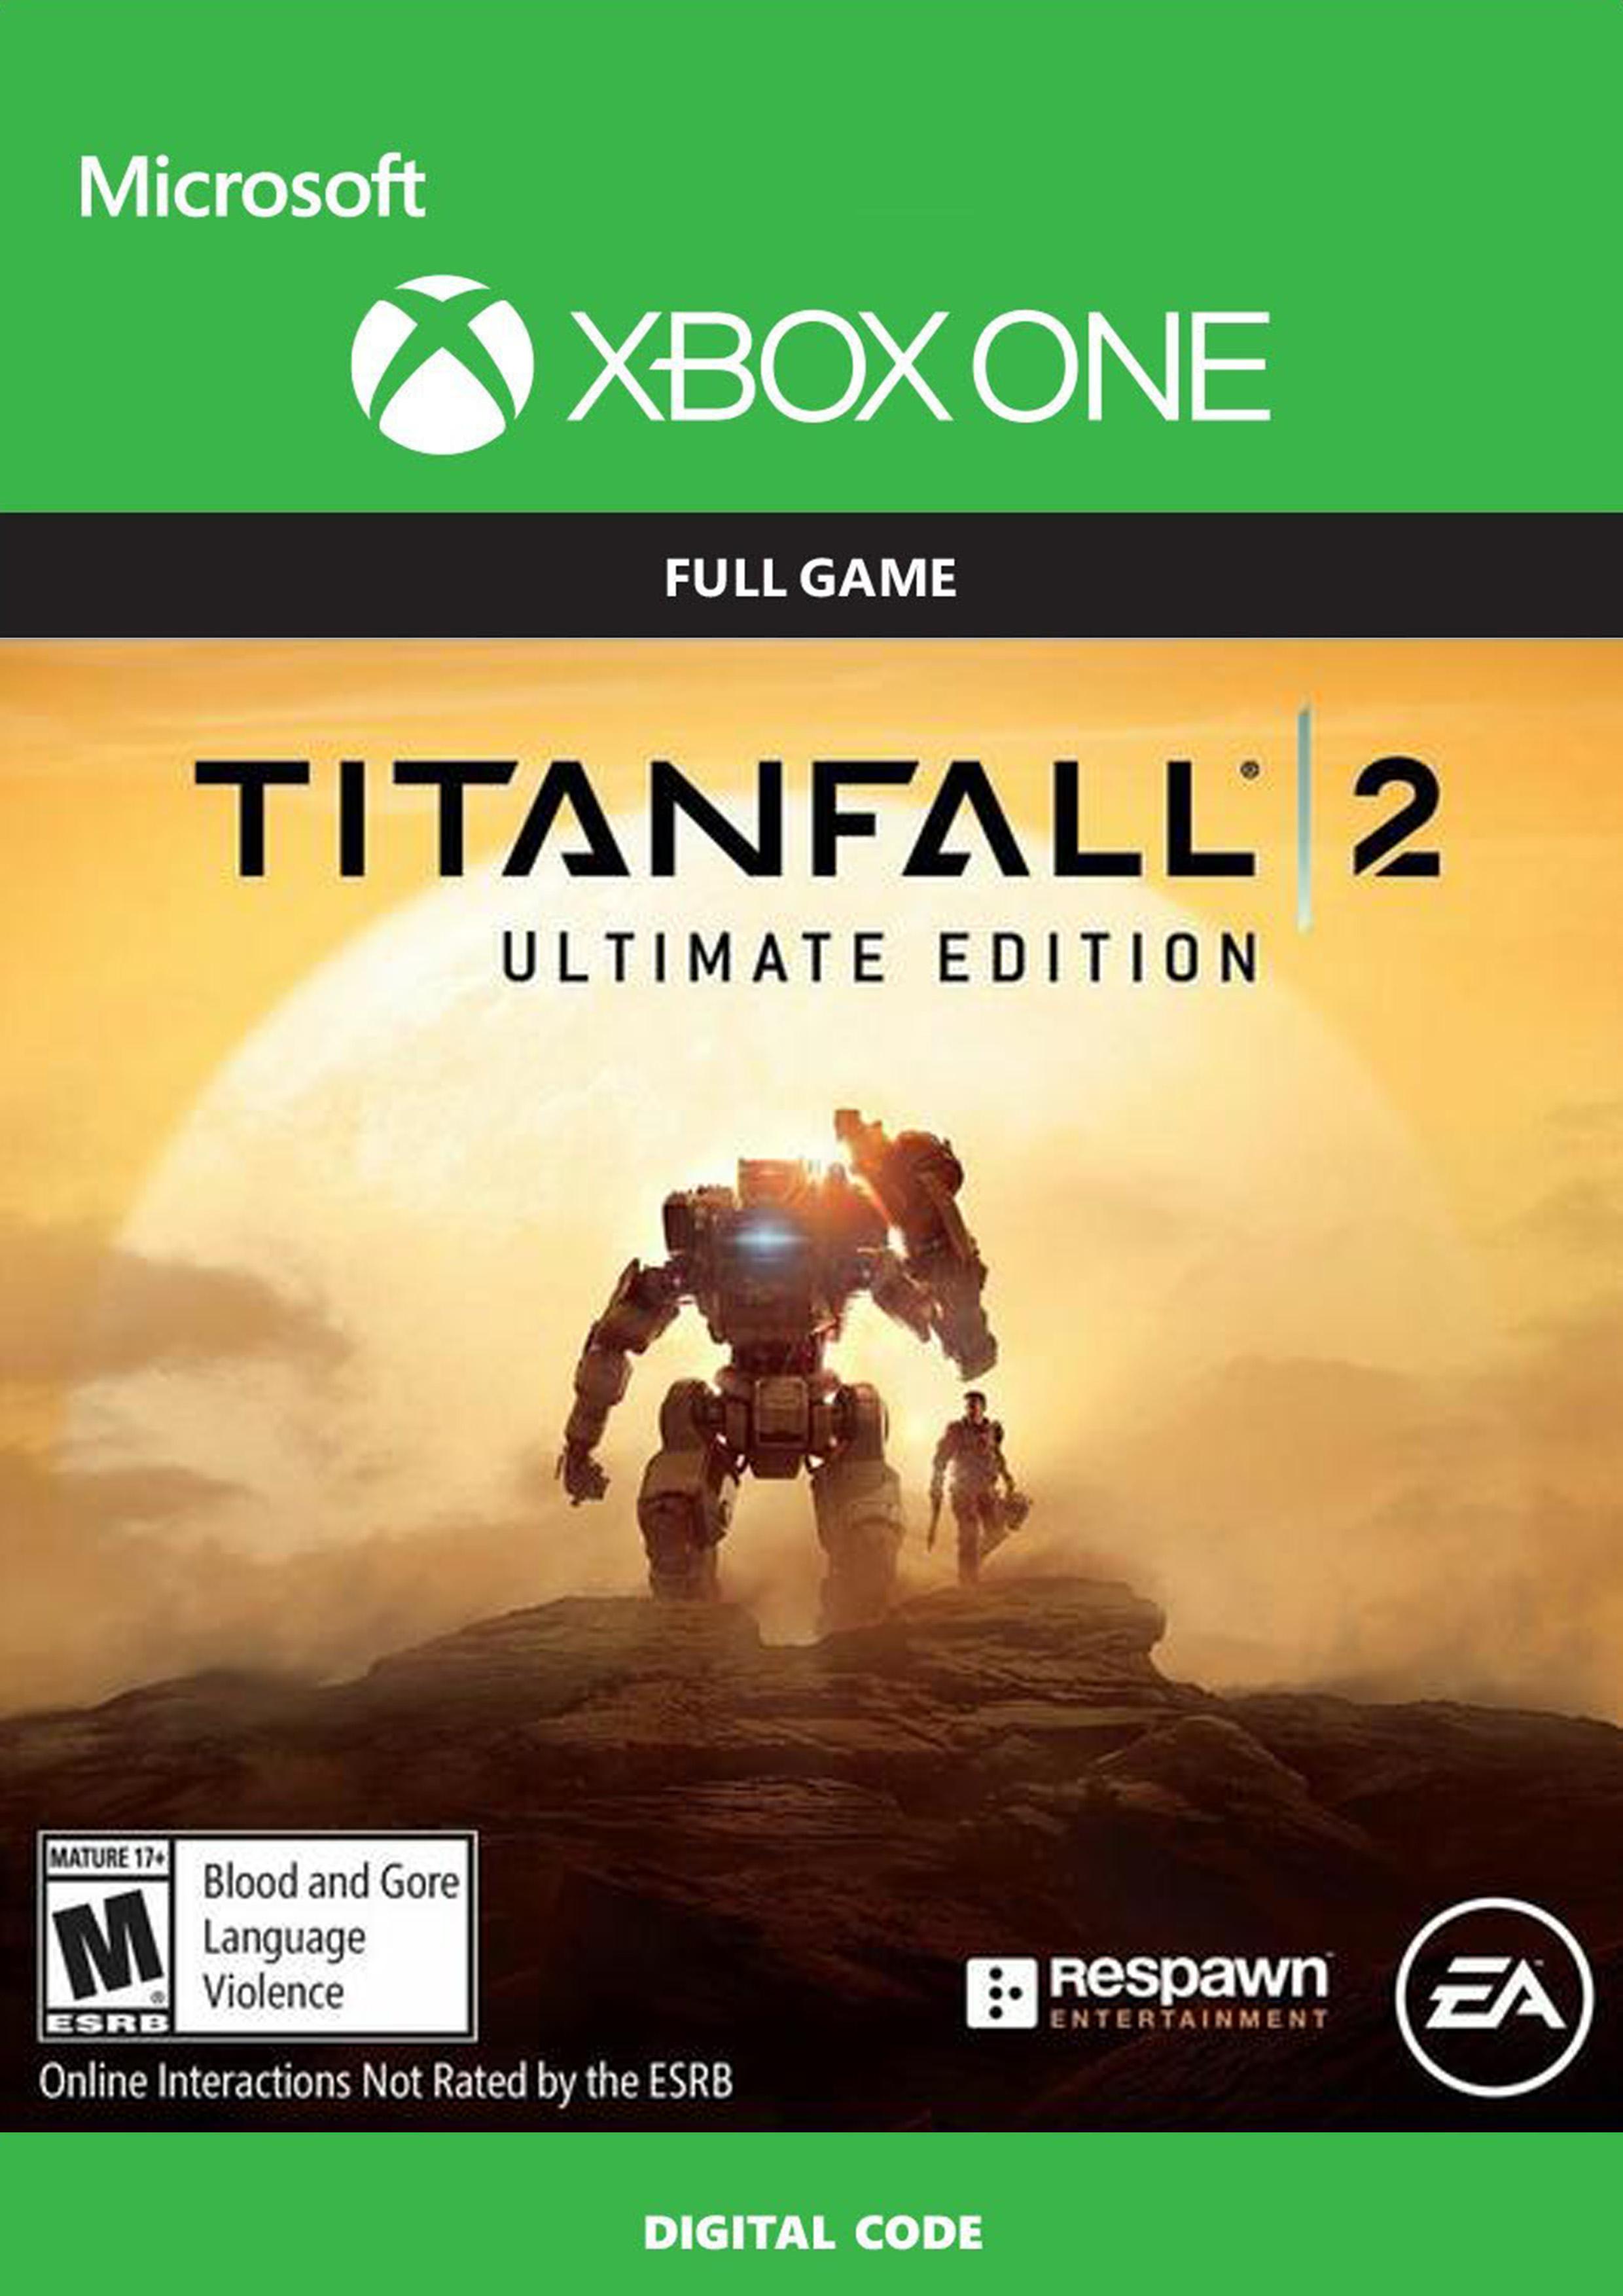 Titanfall 2 Ultimate  (Xbox One / SERIES X|S) Ключ🔑